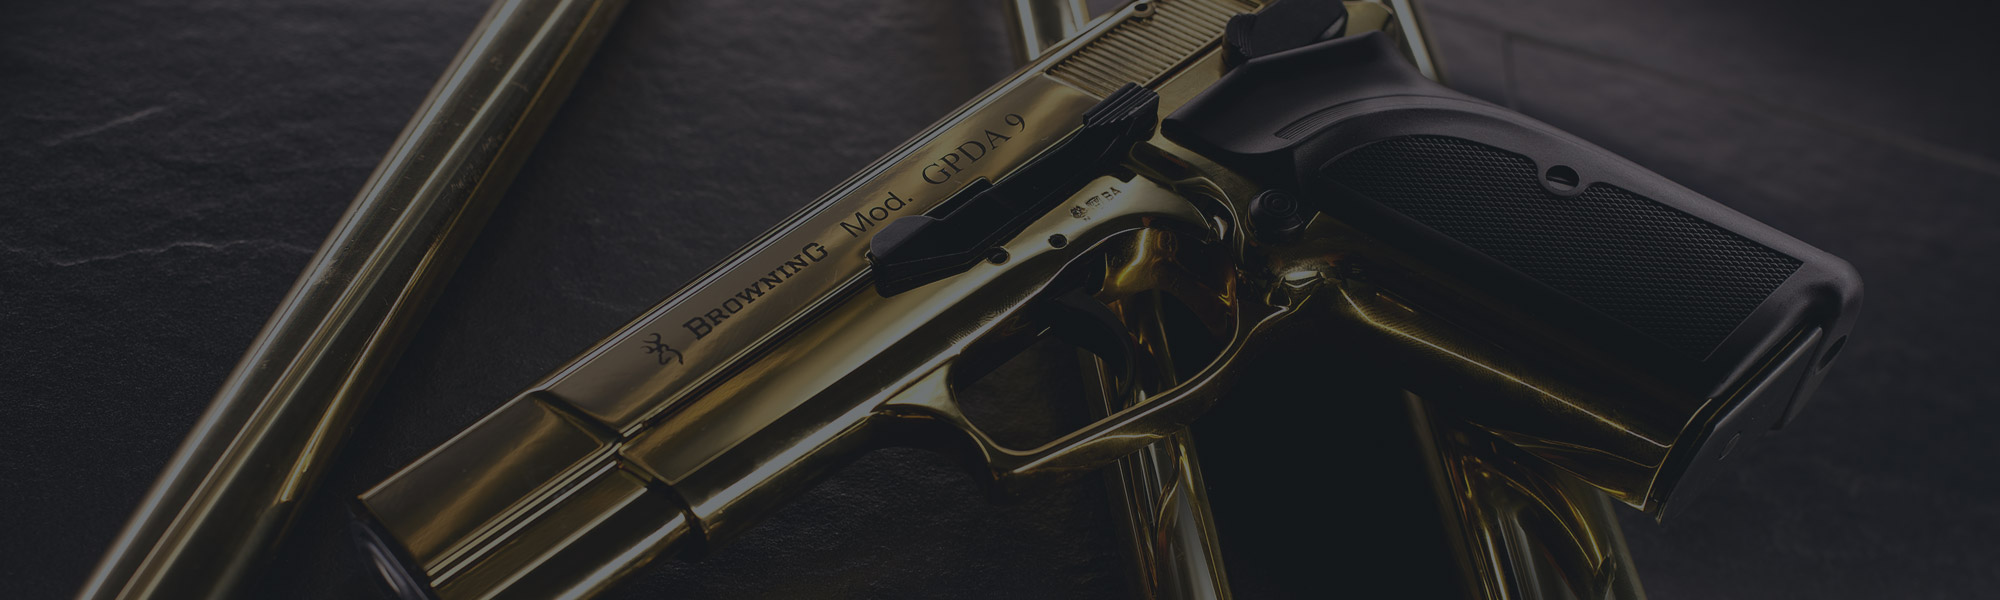 Browning Gas Signal Guns